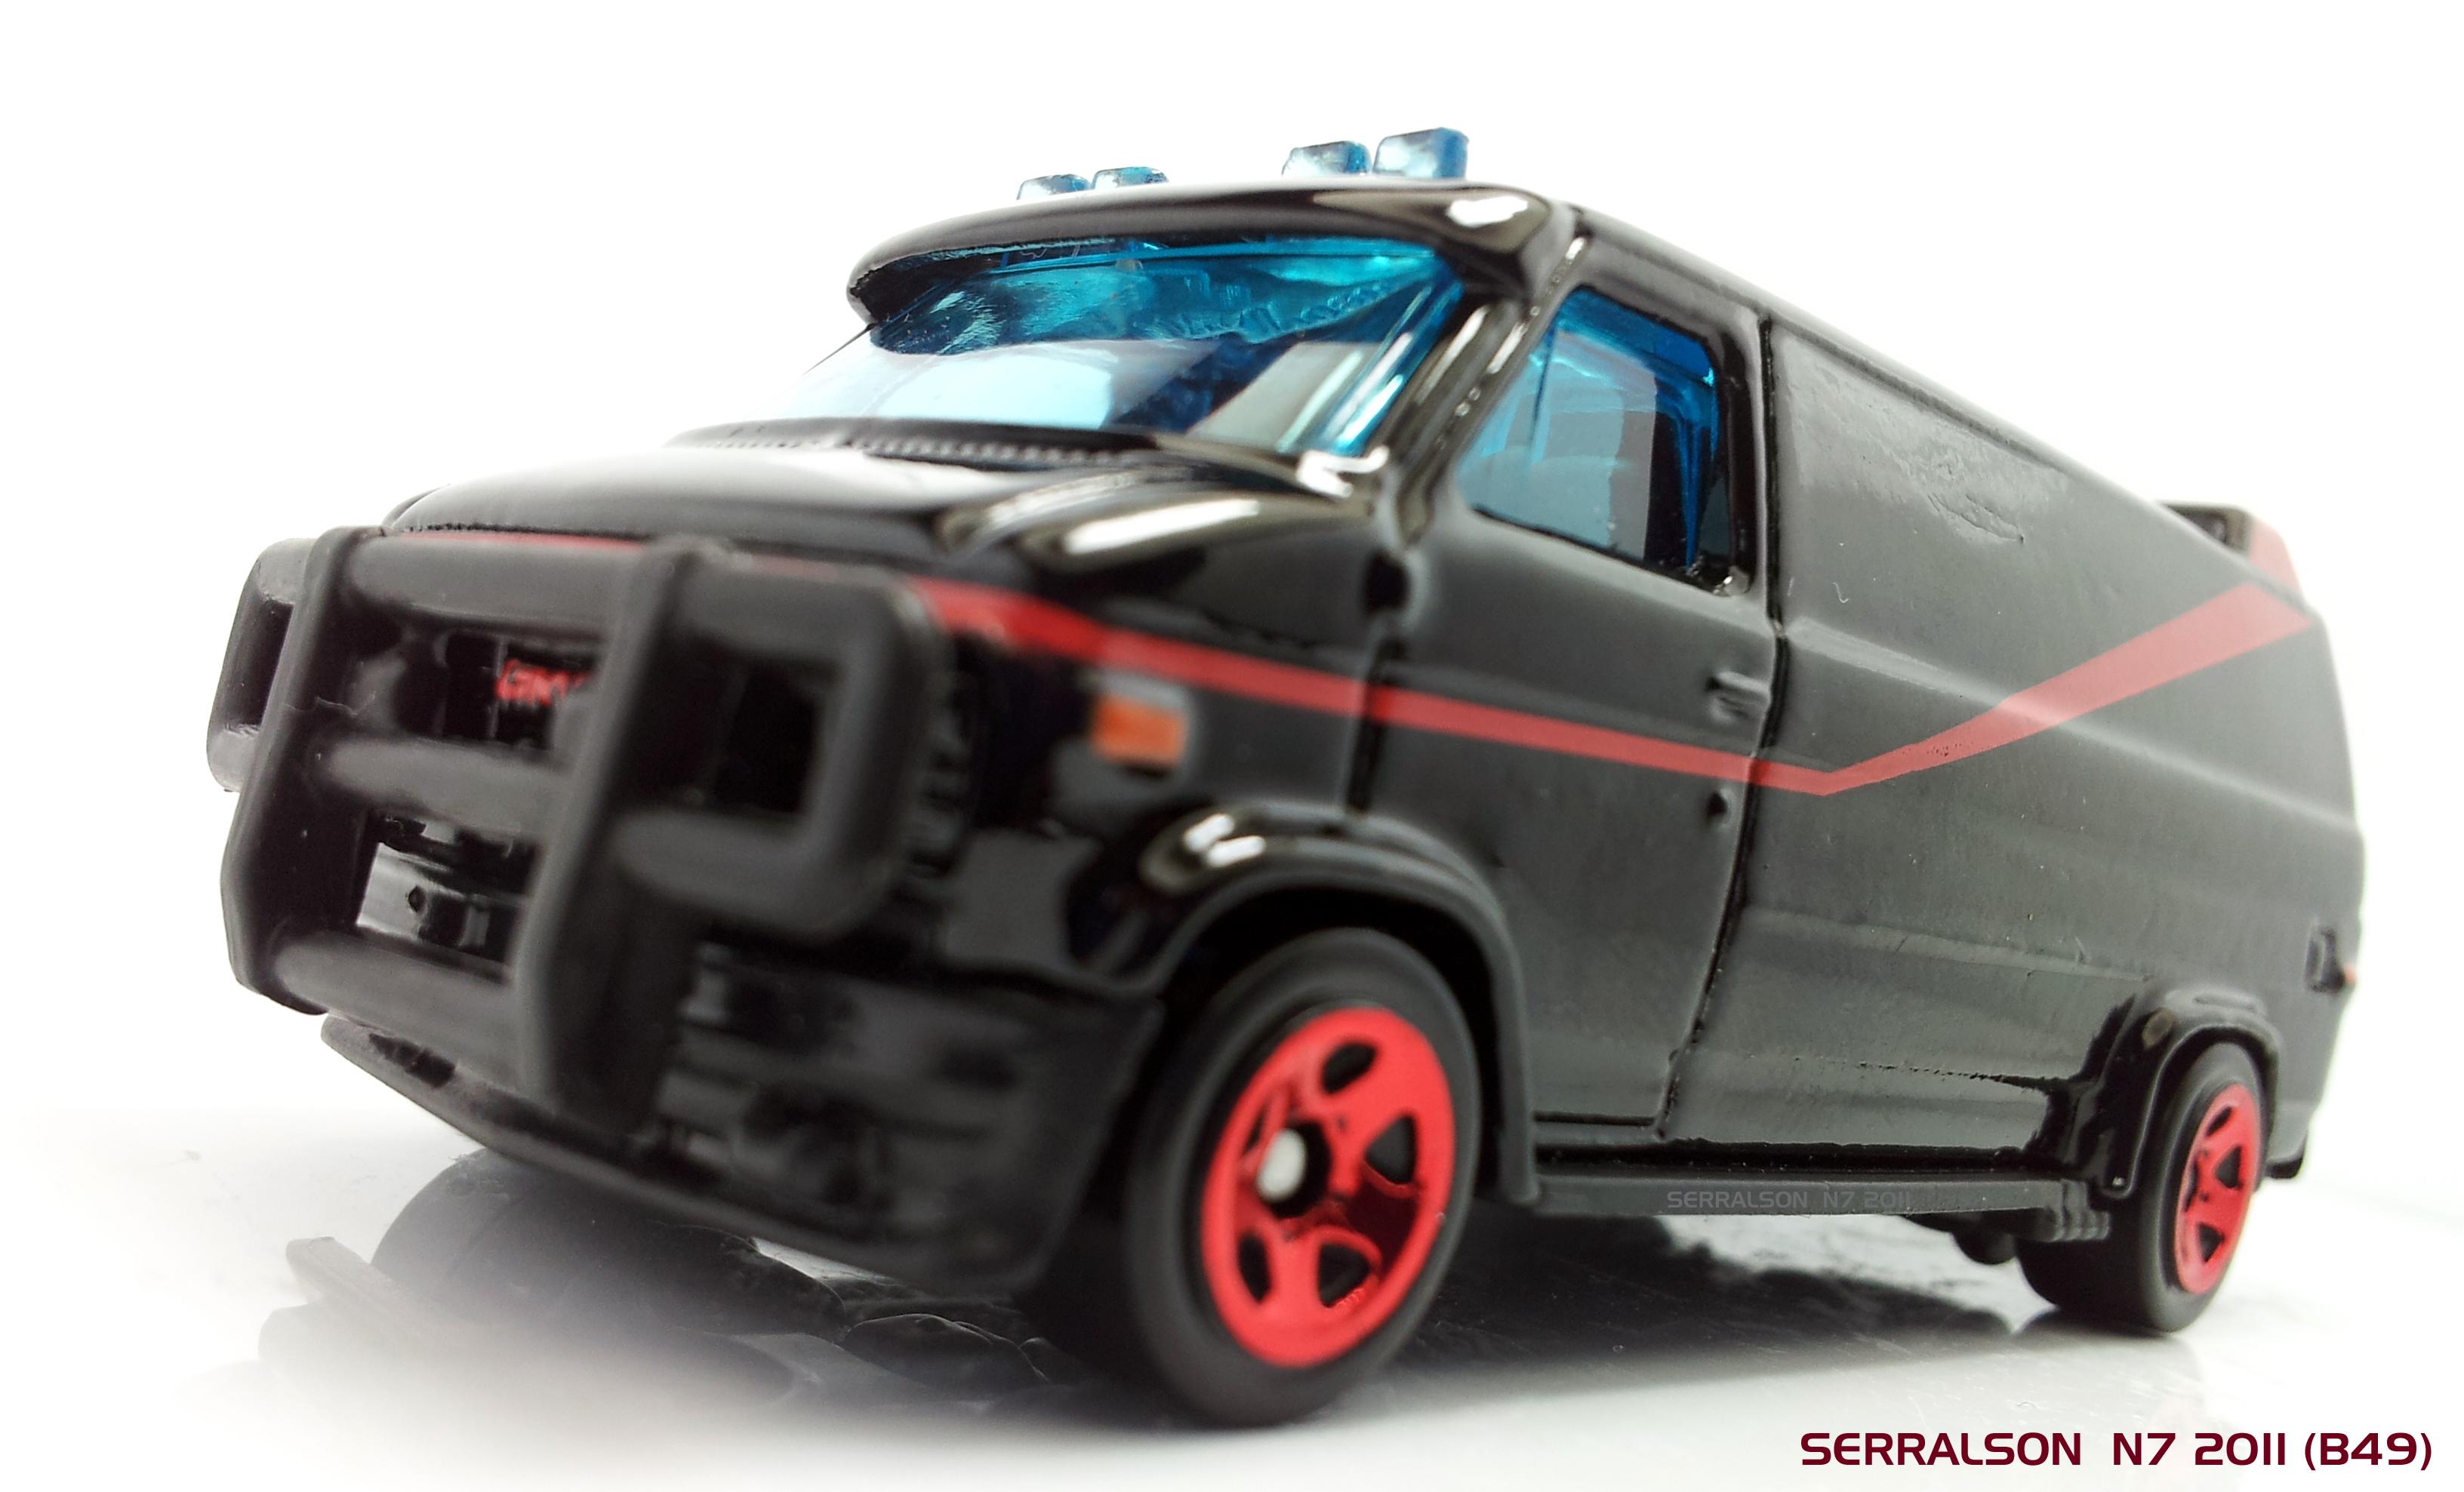 cb powered fandom hot latest wiki gmc wikia vans wheels a by van team